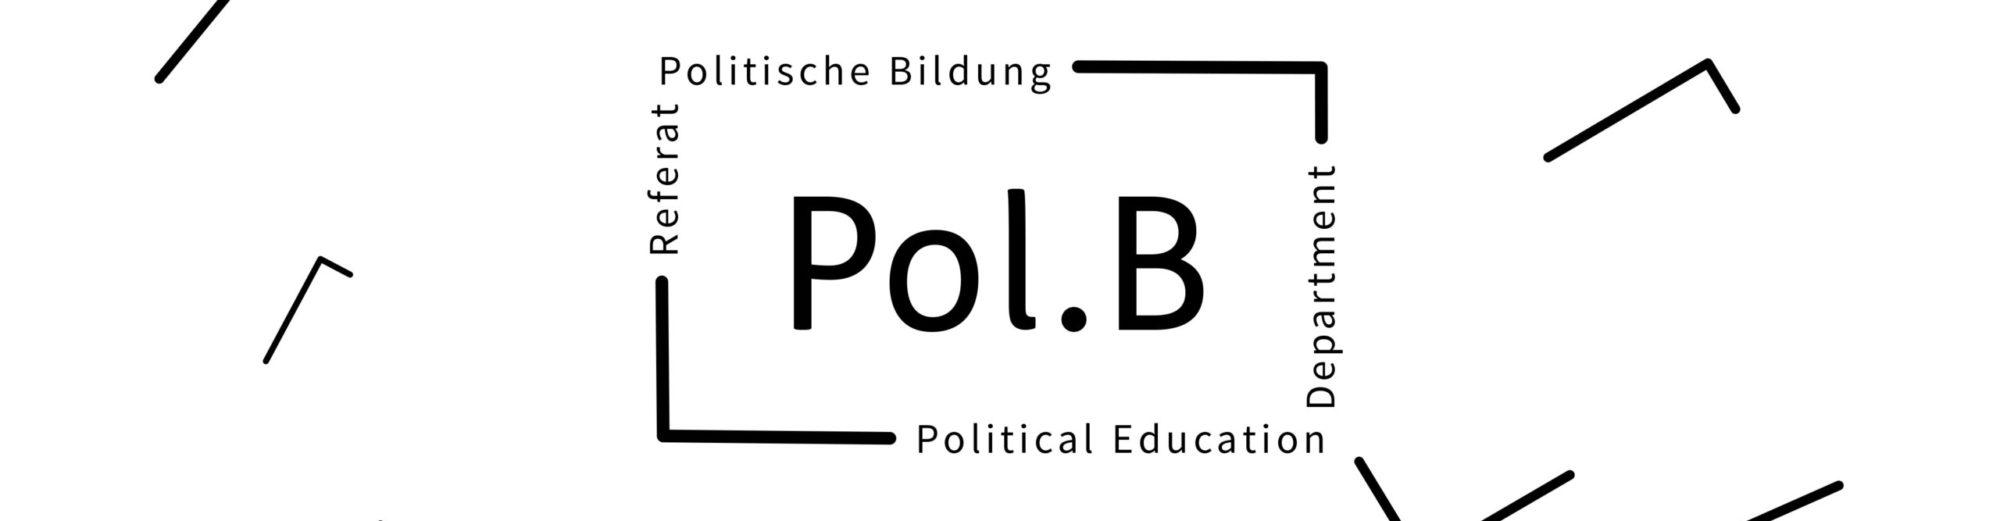 Pol.B